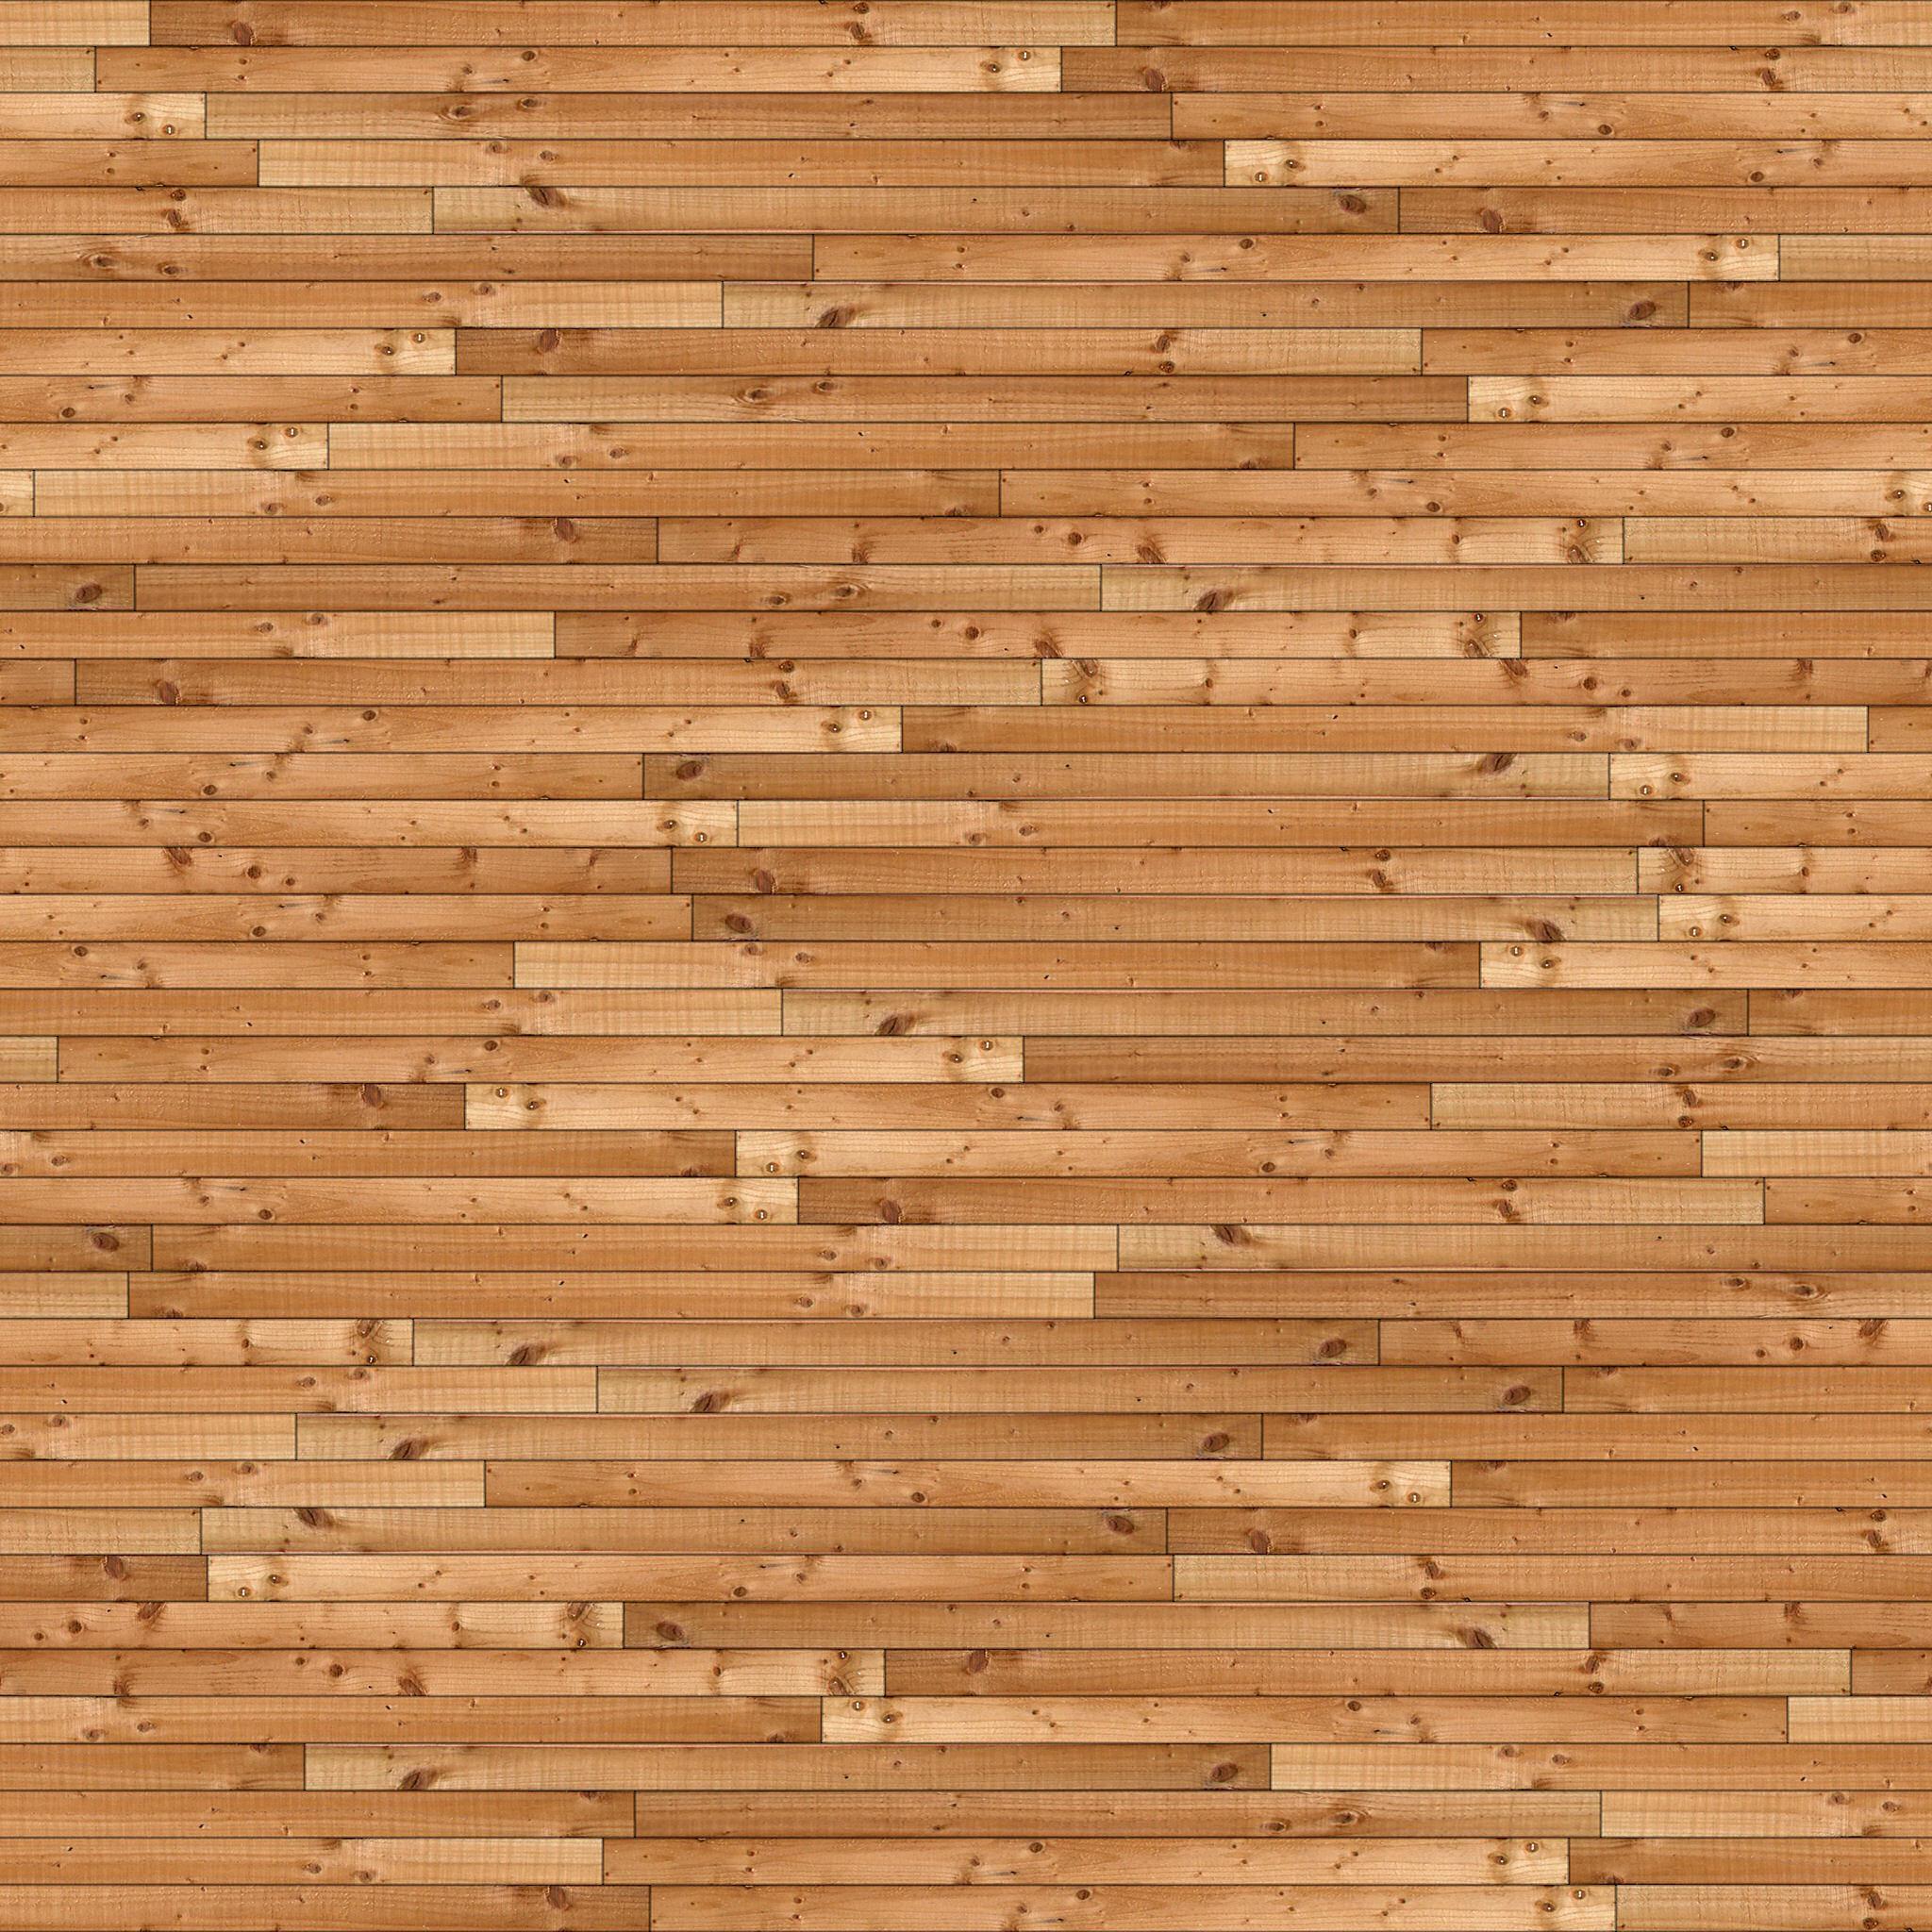 Wood Floor Texture https://www.woodesigner.net provides fantastic guidance as